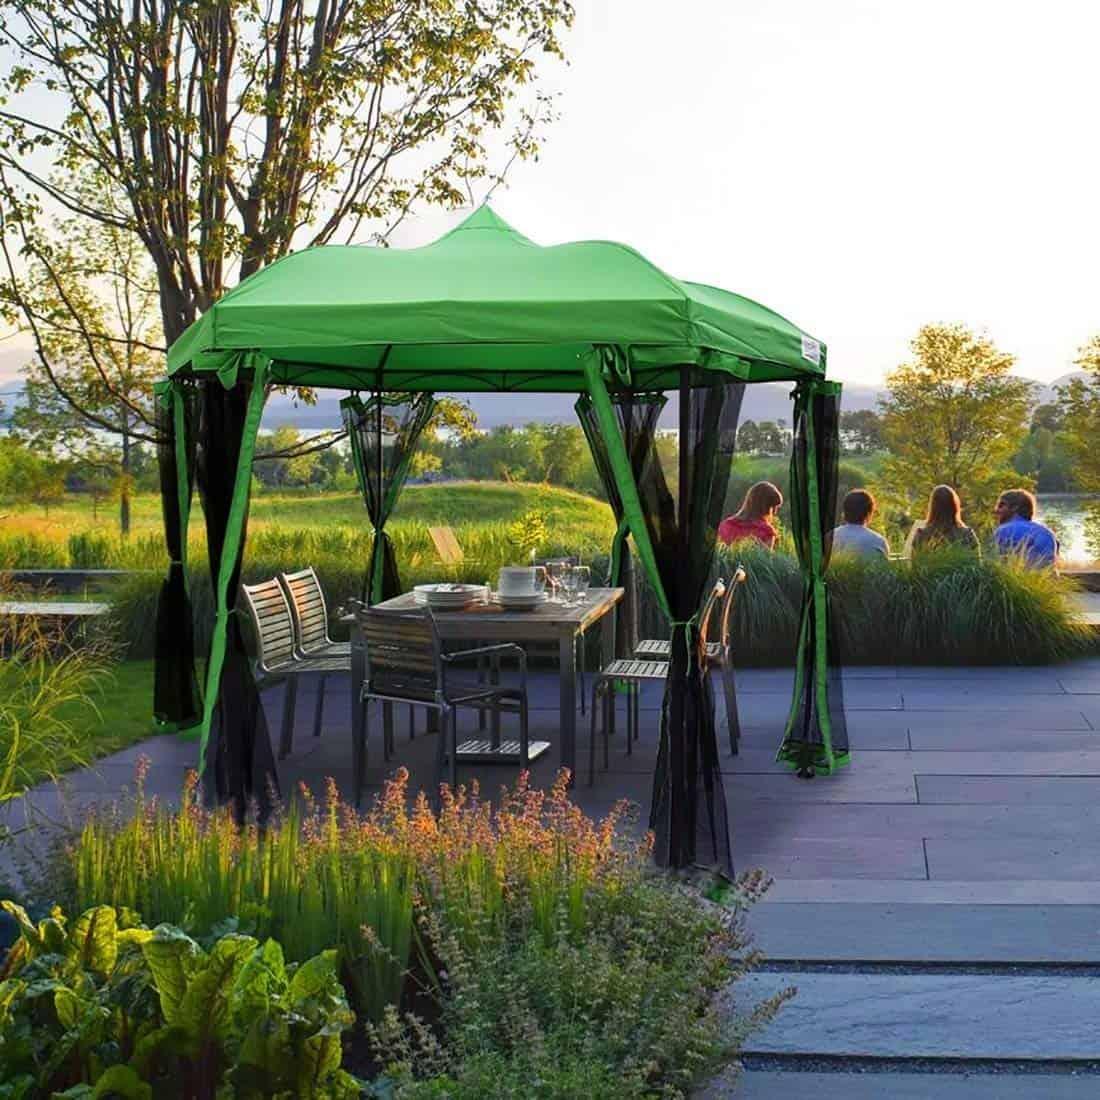 backyard-pergola-kits - Best Metal Pergola Kits For Backyard Garden - The Rex Garden